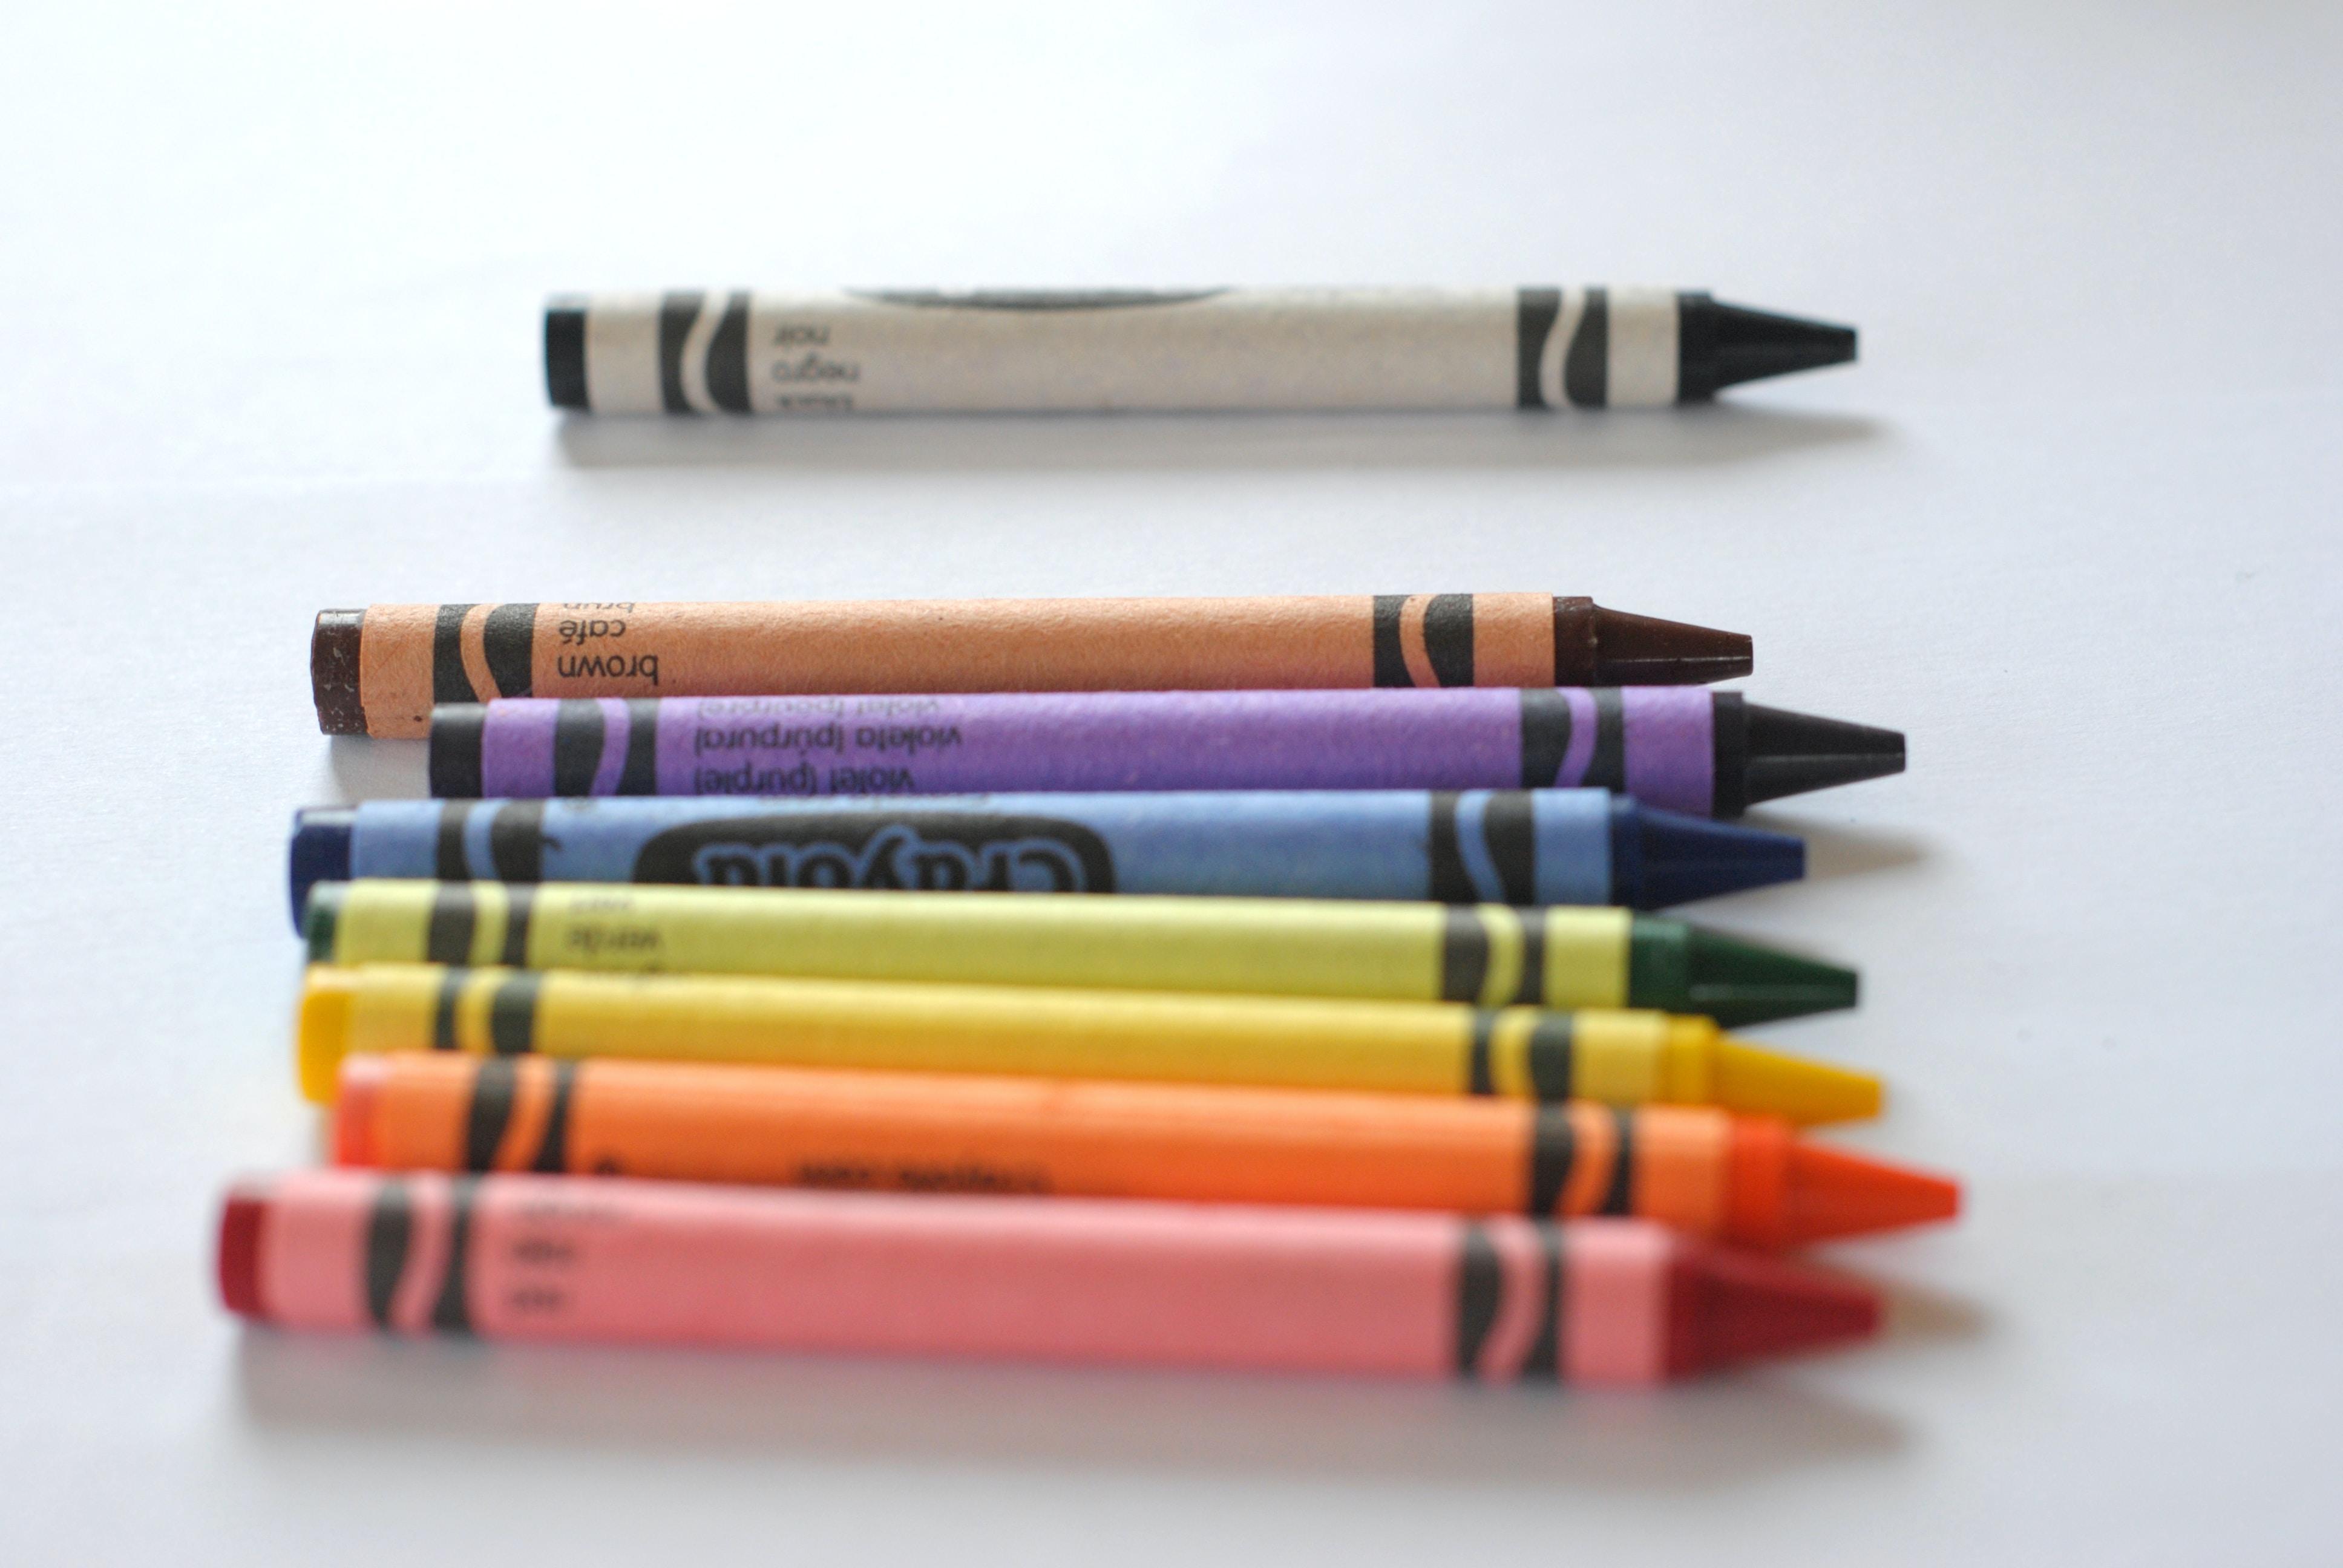 assorted-colored Crayola crayons